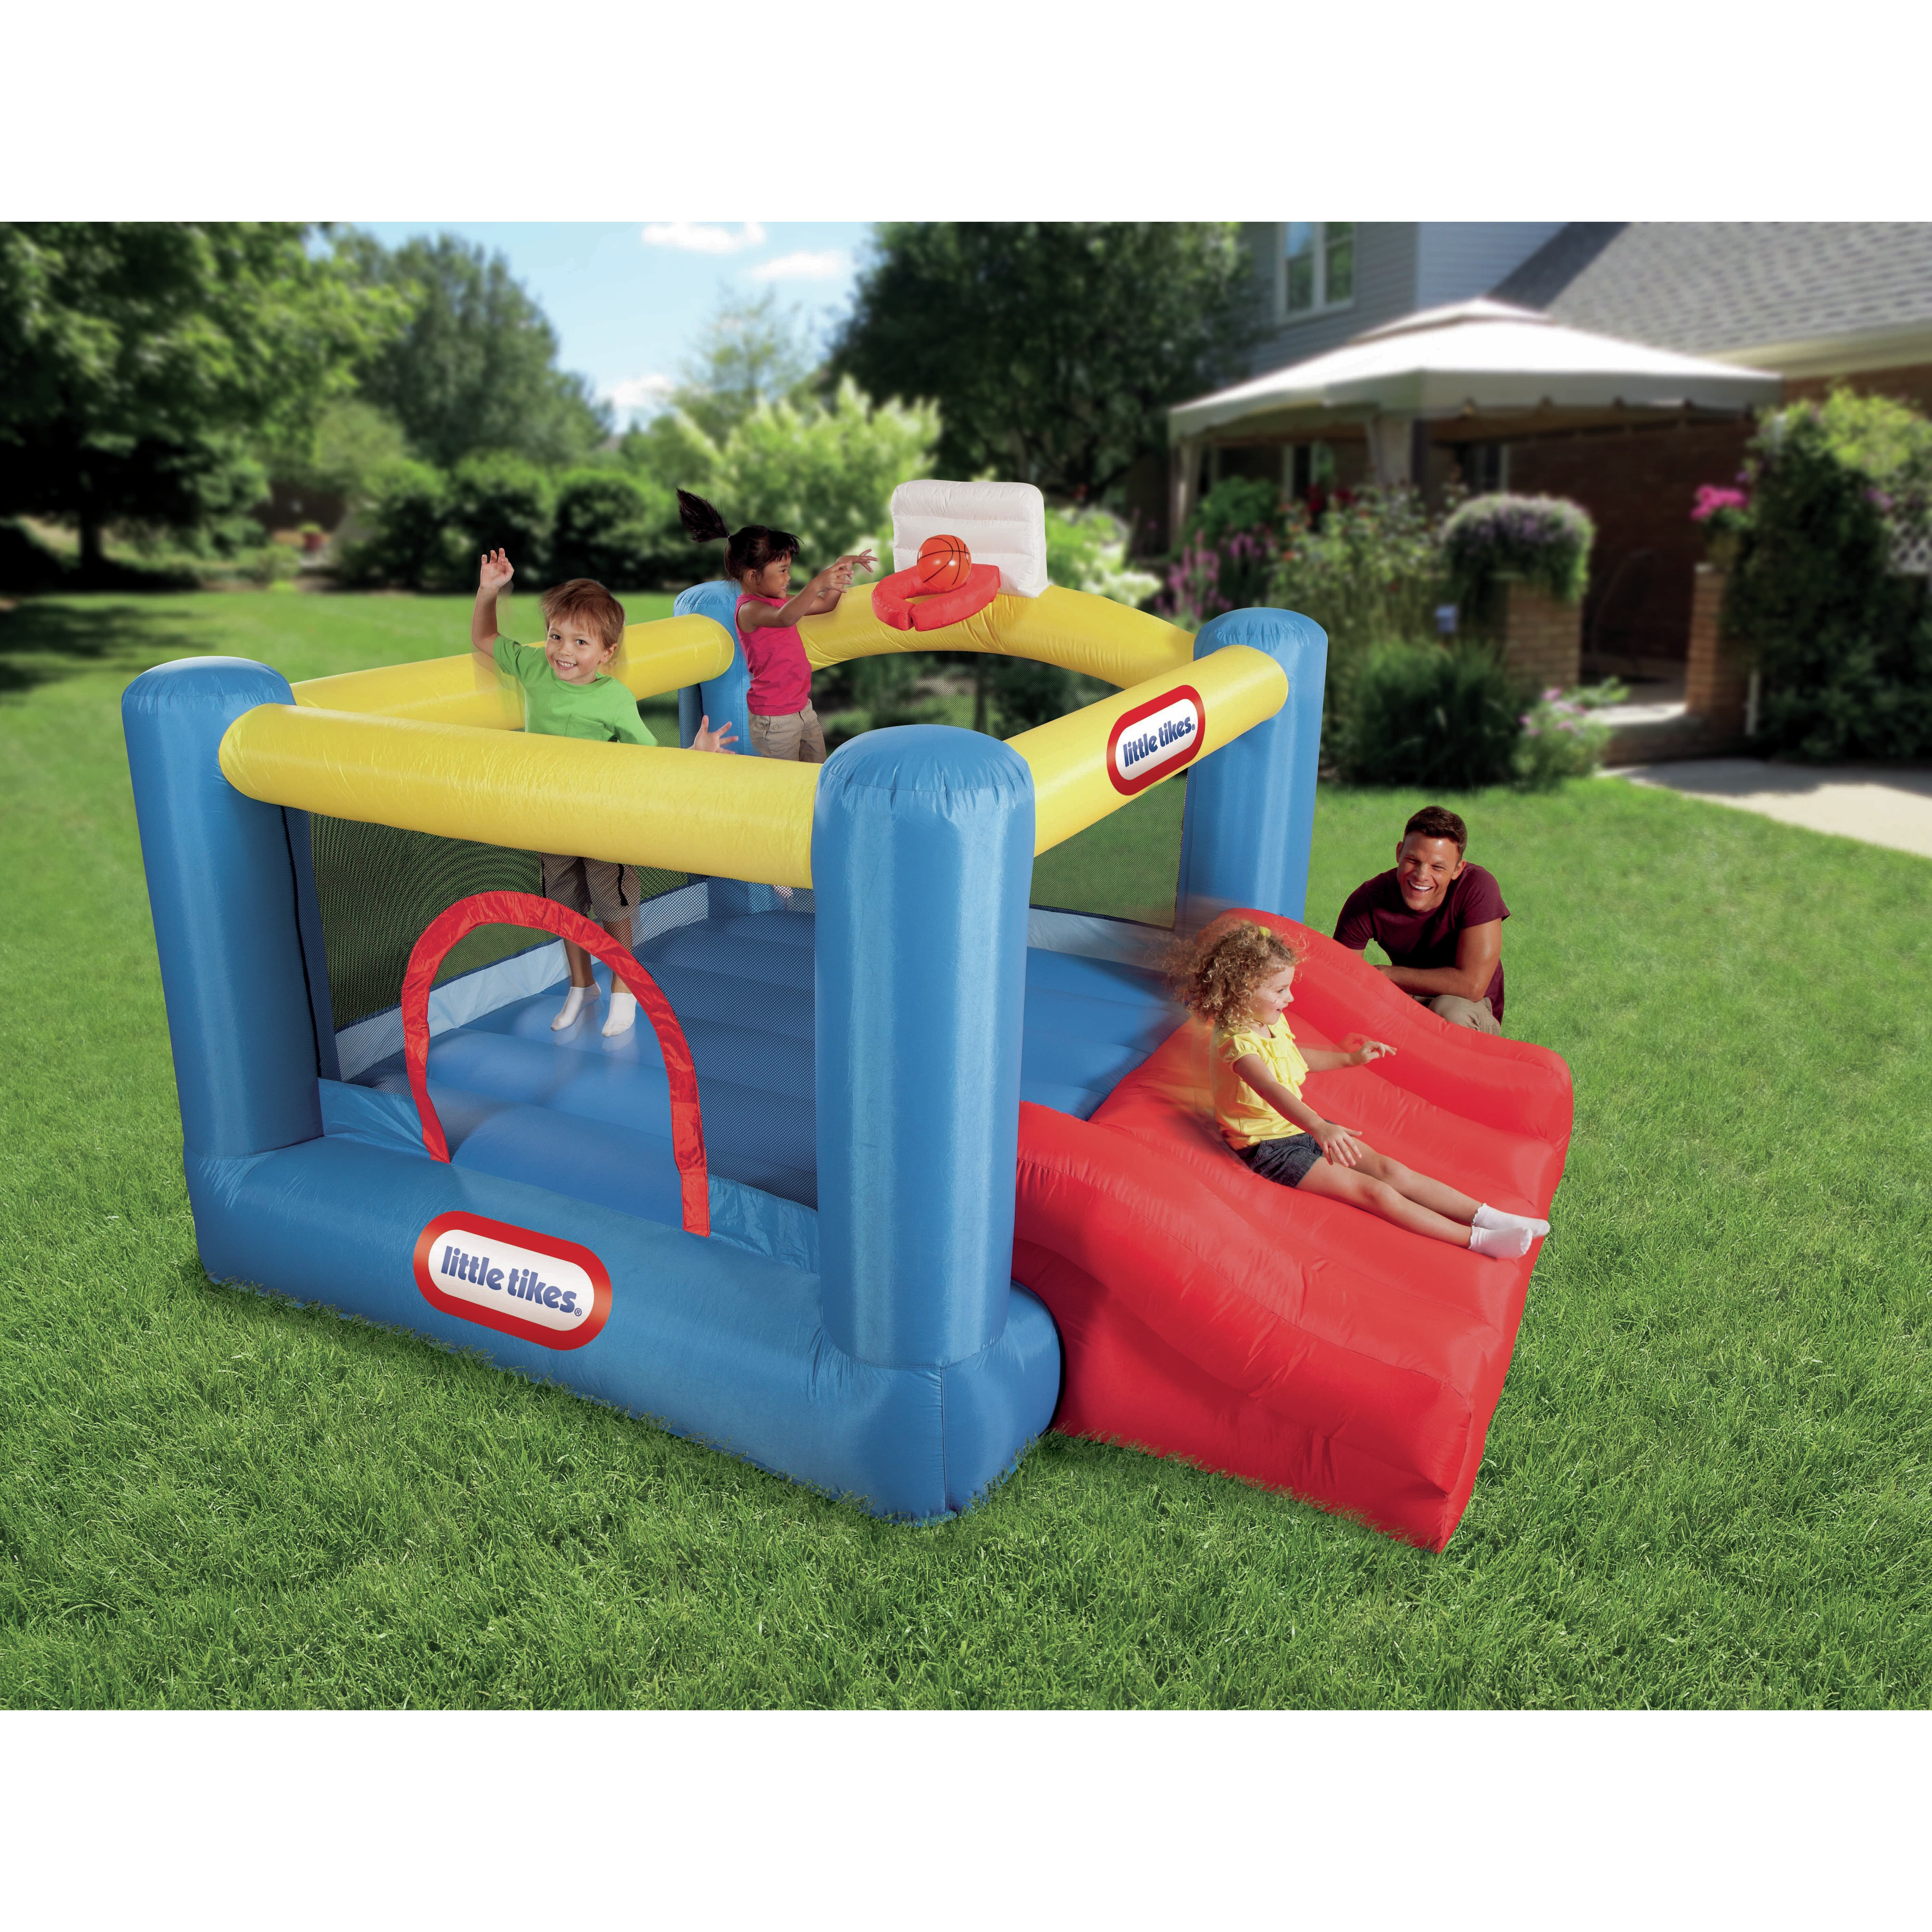 Little Tikes Outdoor Kitchen Little Tikes Jr Sports N Slide Bounce House Reviews Wayfair